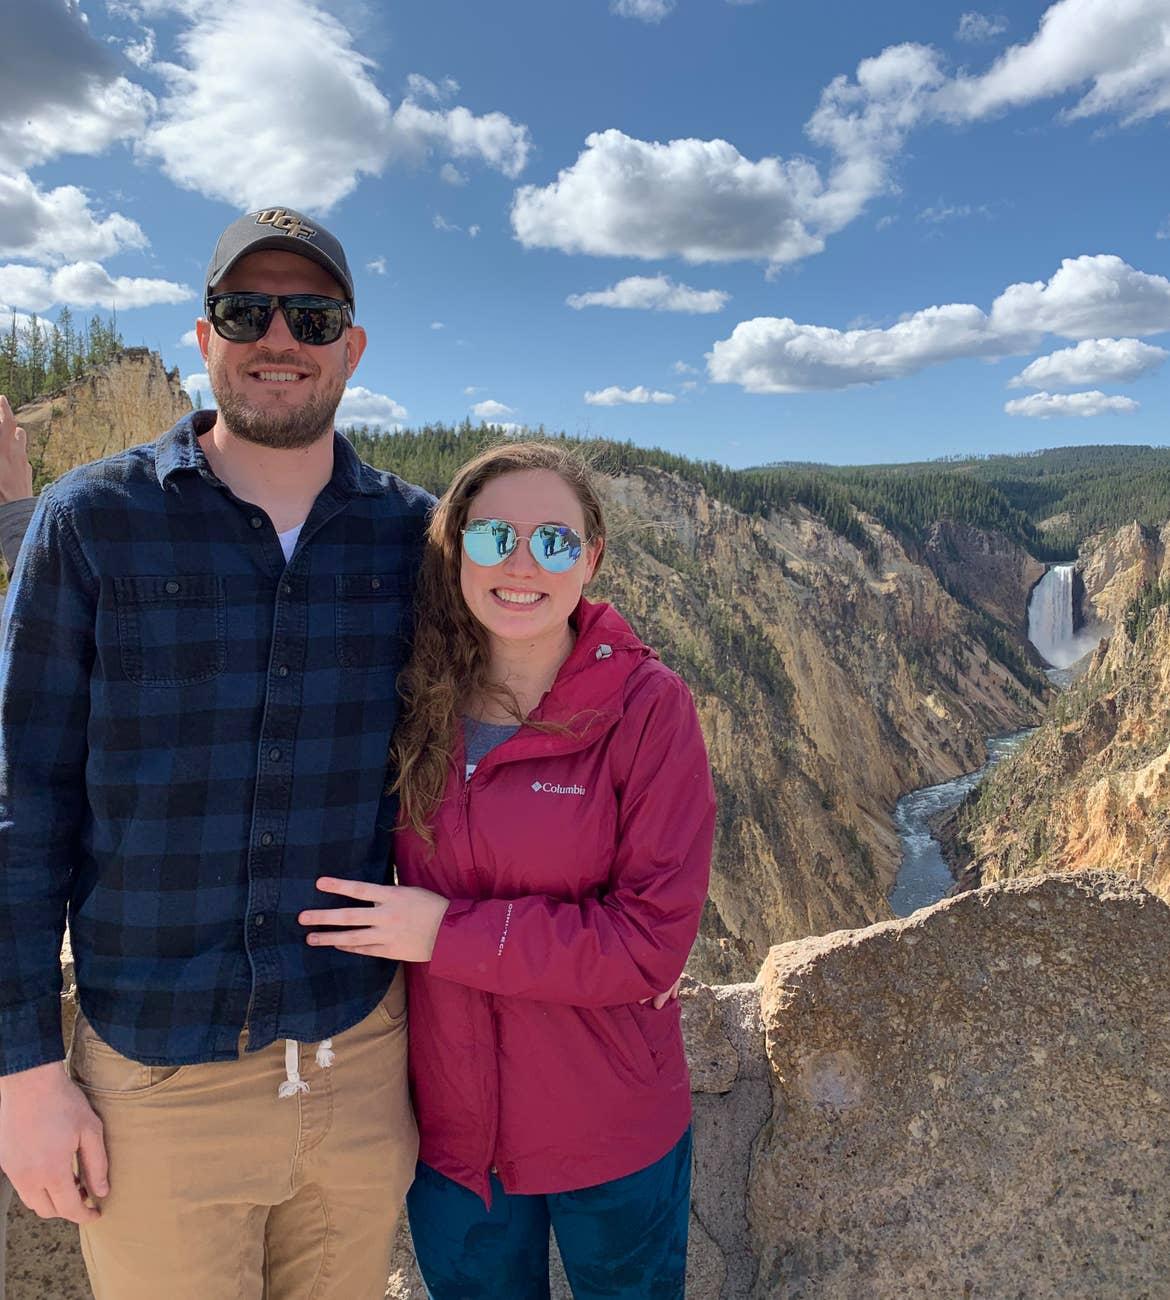 Ashley and her boyfriend at Yellowstone